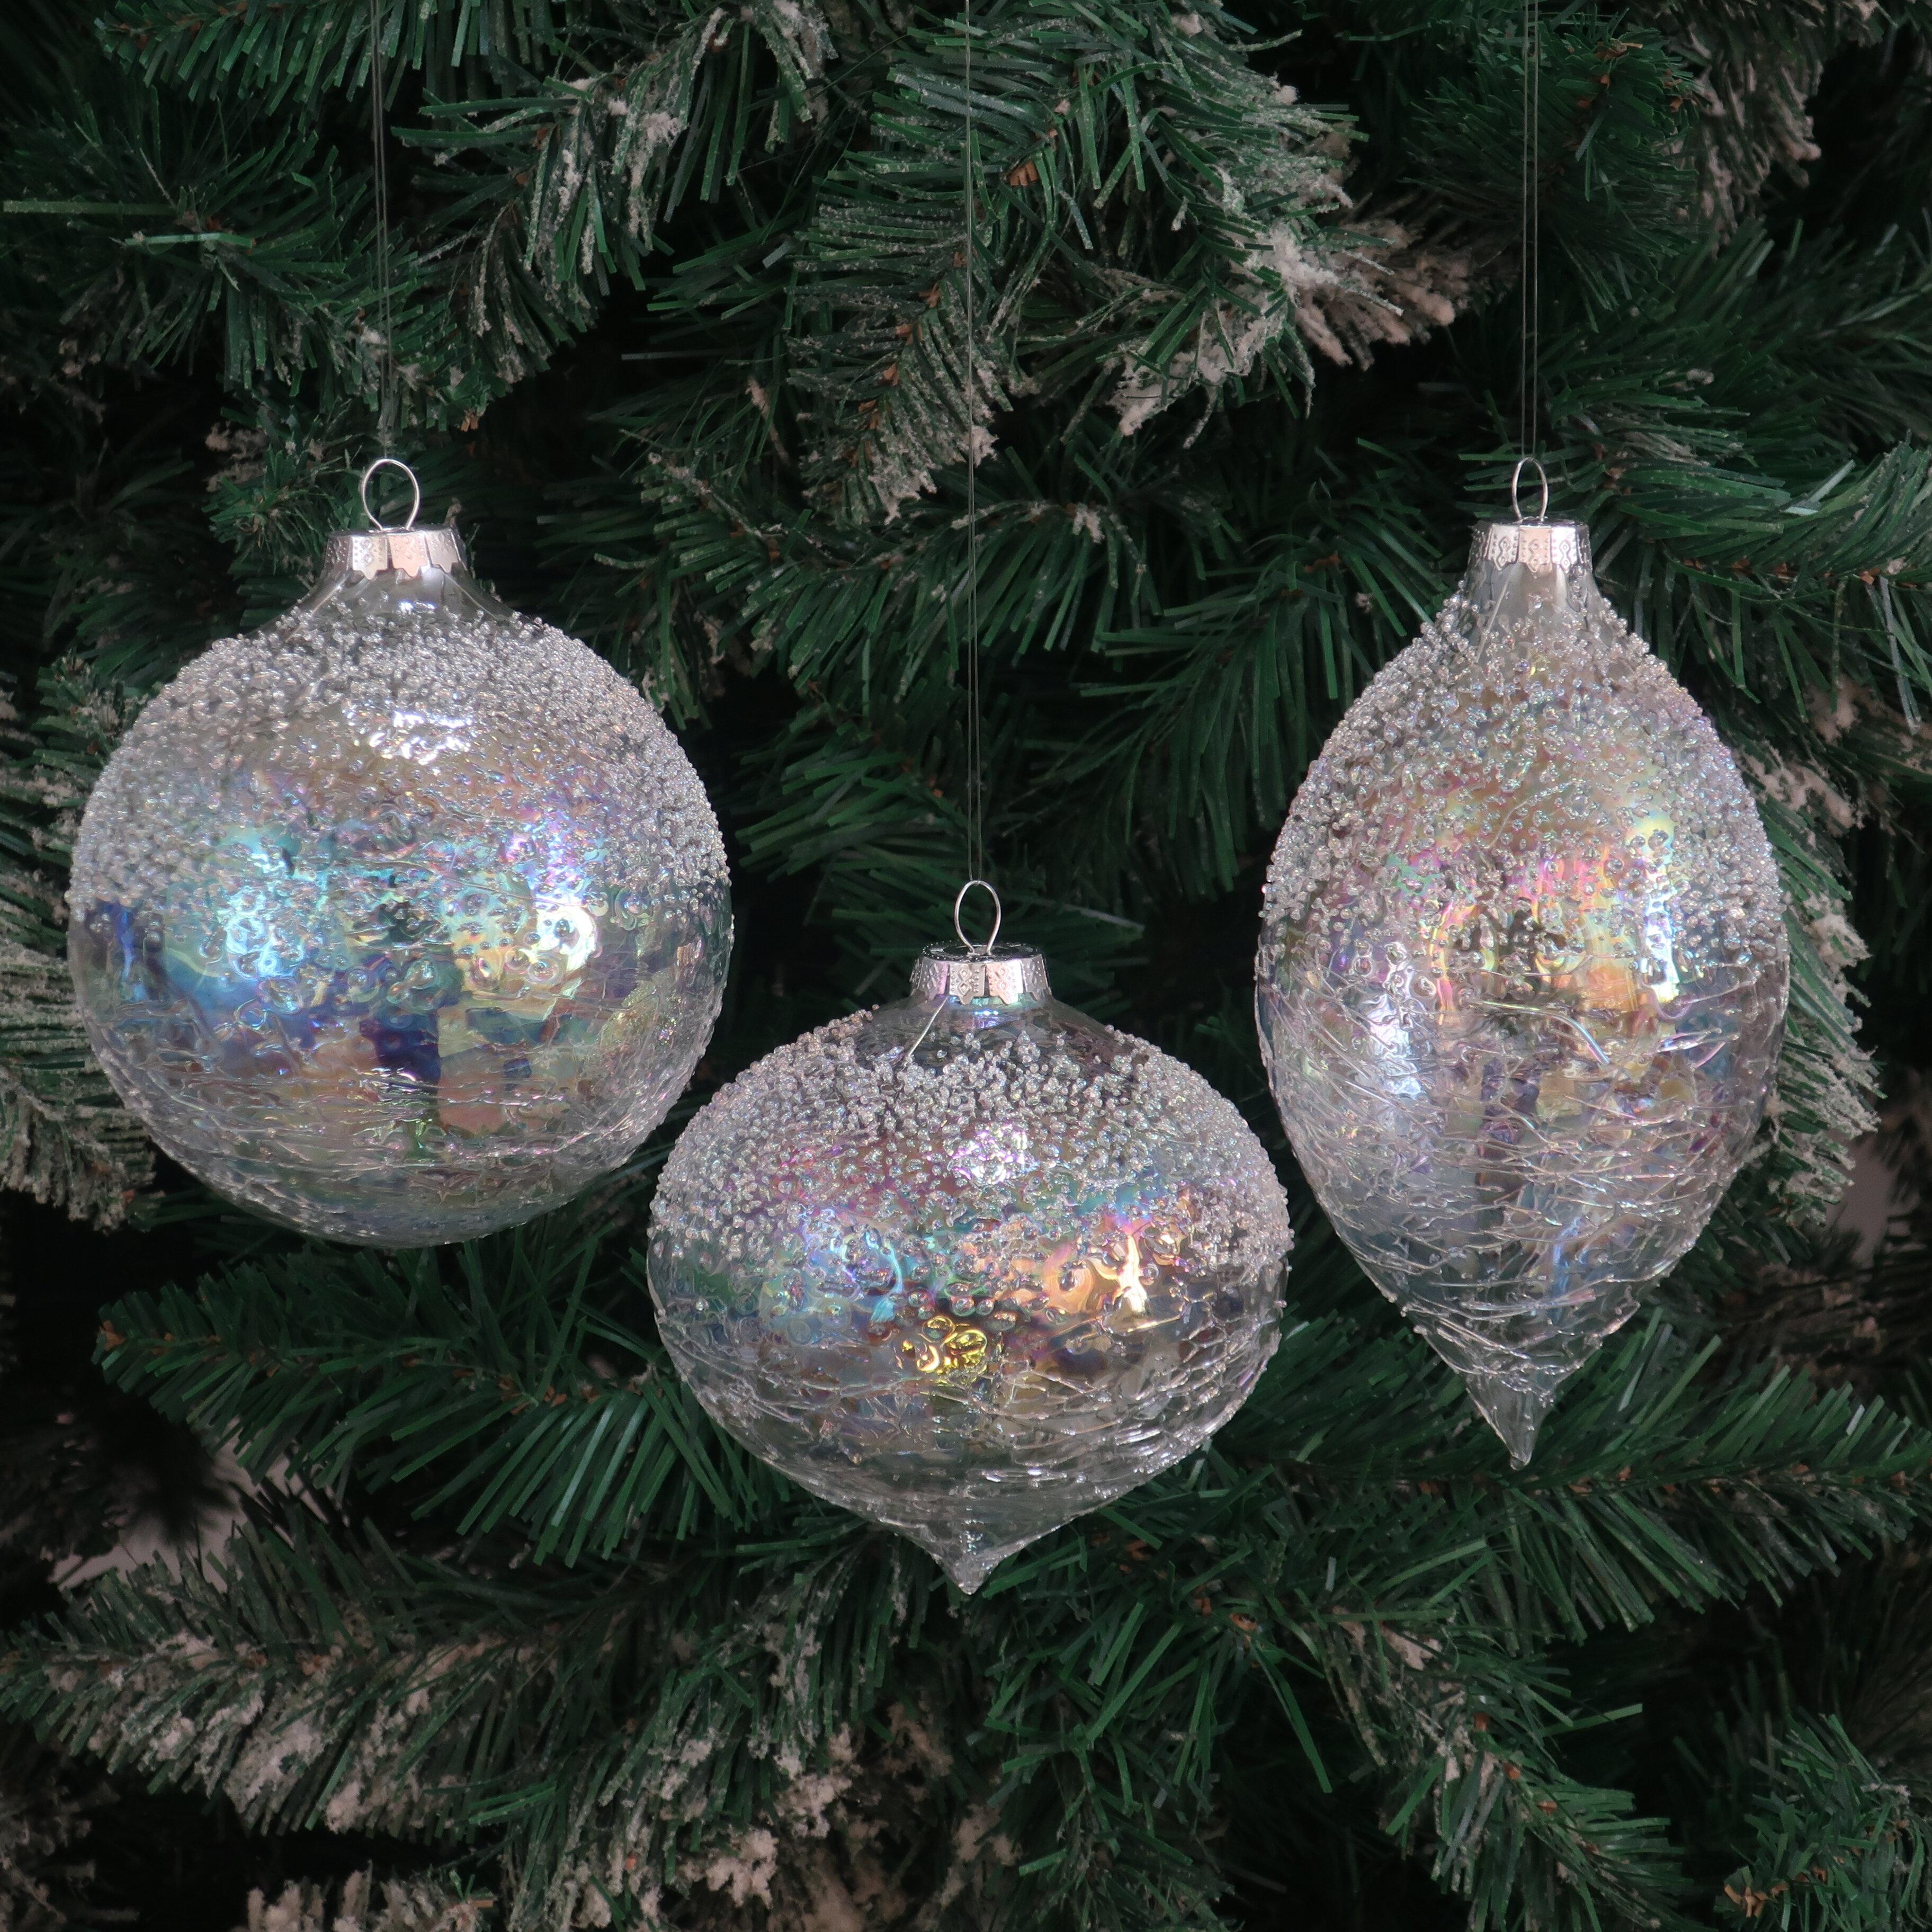 Glass Christmas Ornaments Free Shipping Over 35 Wayfair